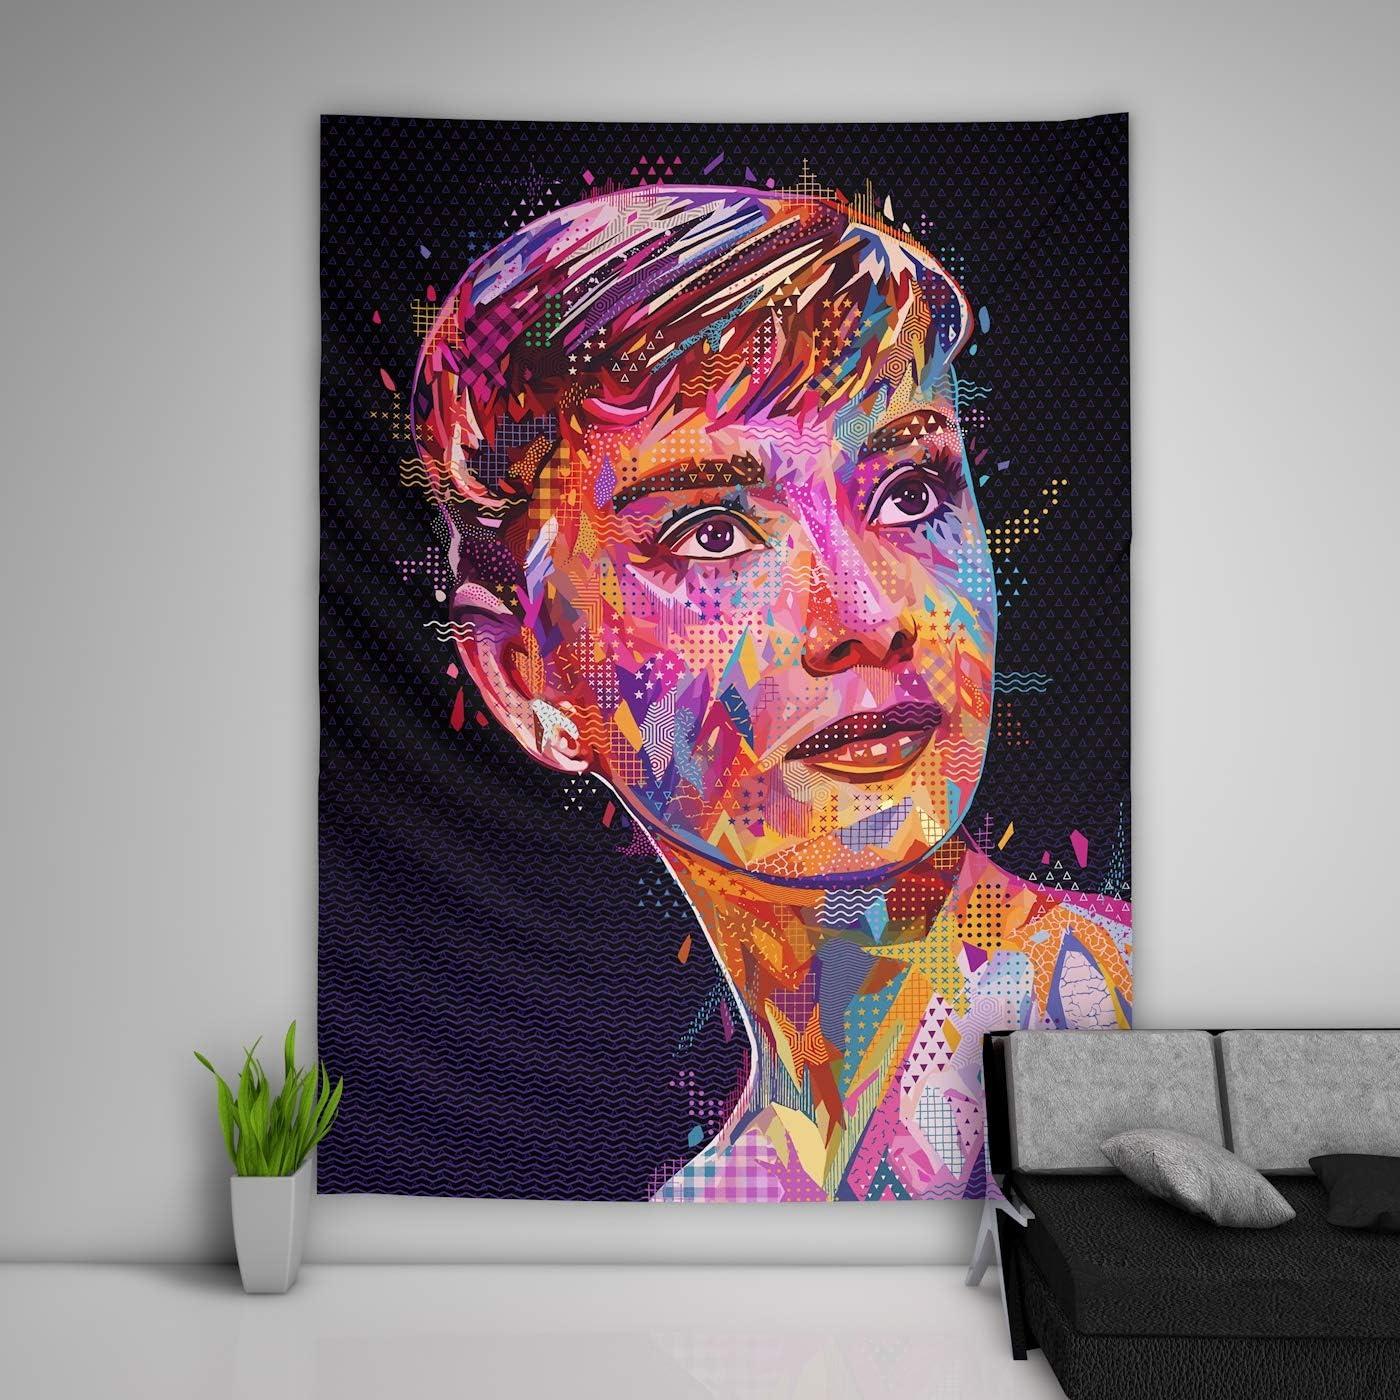 JackGo7 Audrey Hepburn Tapestry Art Wall Hanging Sofa Table Bed Cover Mural Beach Blanket Home Dorm Room Decor Gift